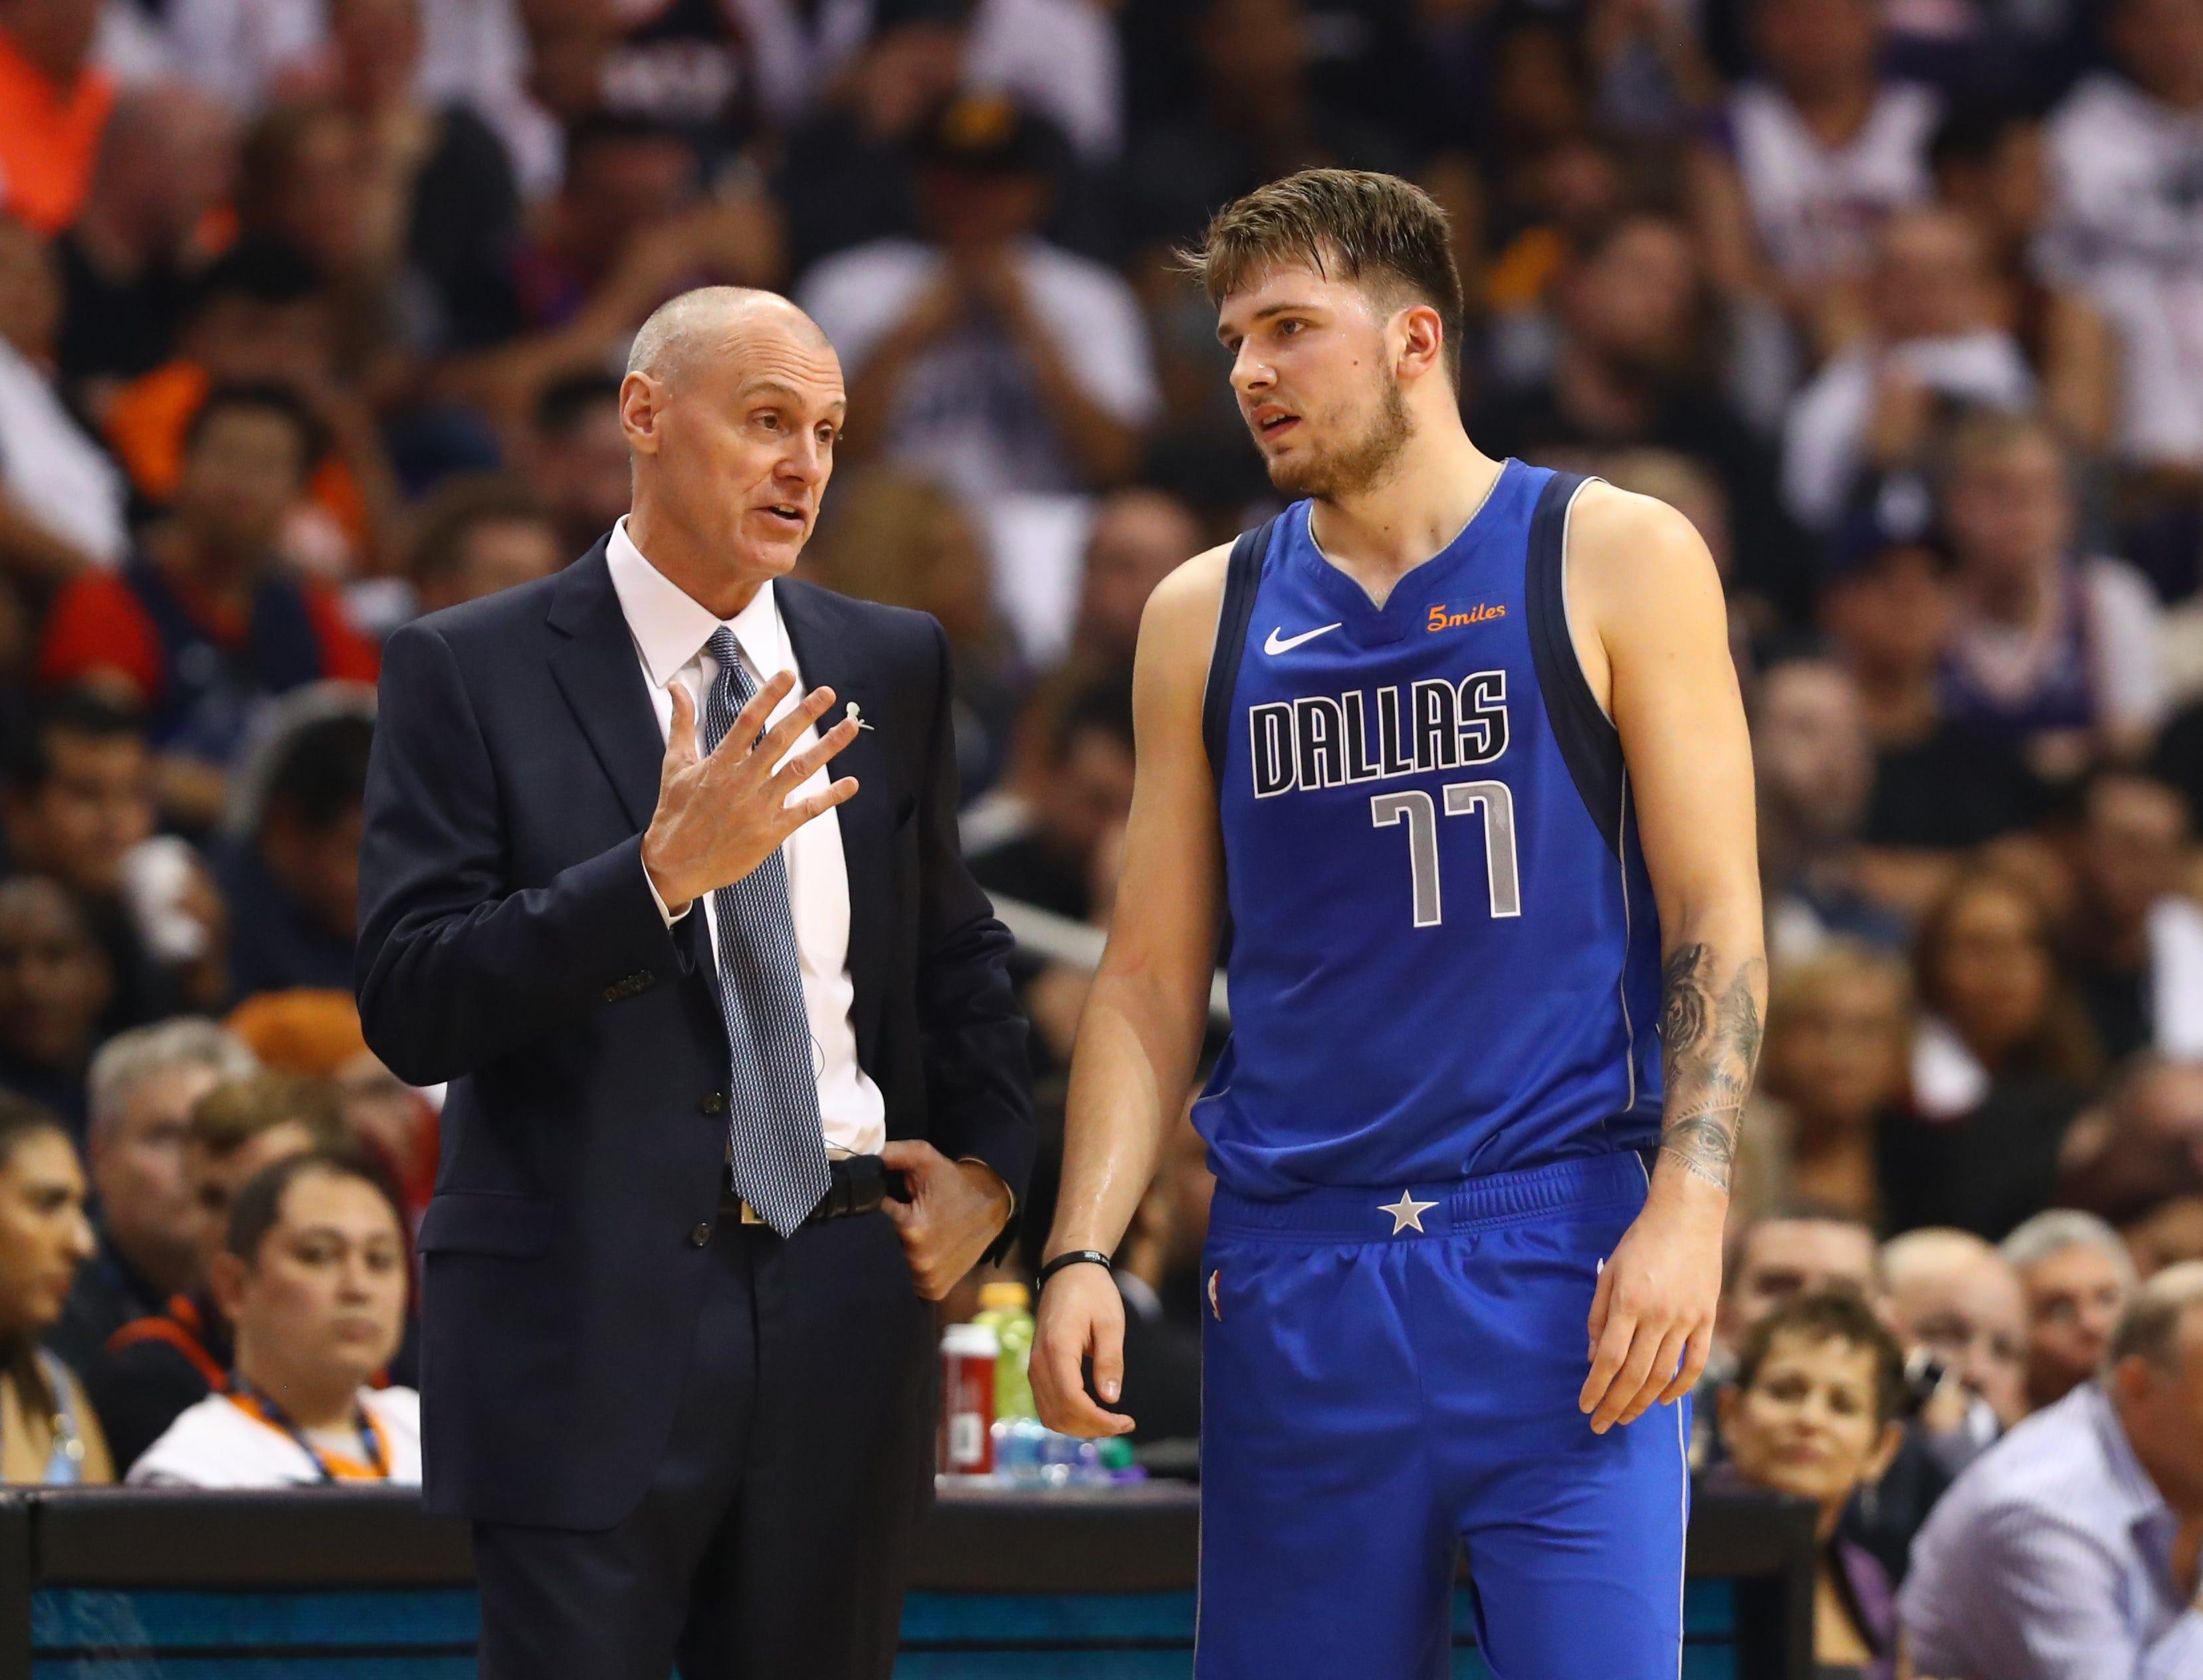 Longtime Dallas Mavericks coach Rick Carlisle steps down after 13 seasons